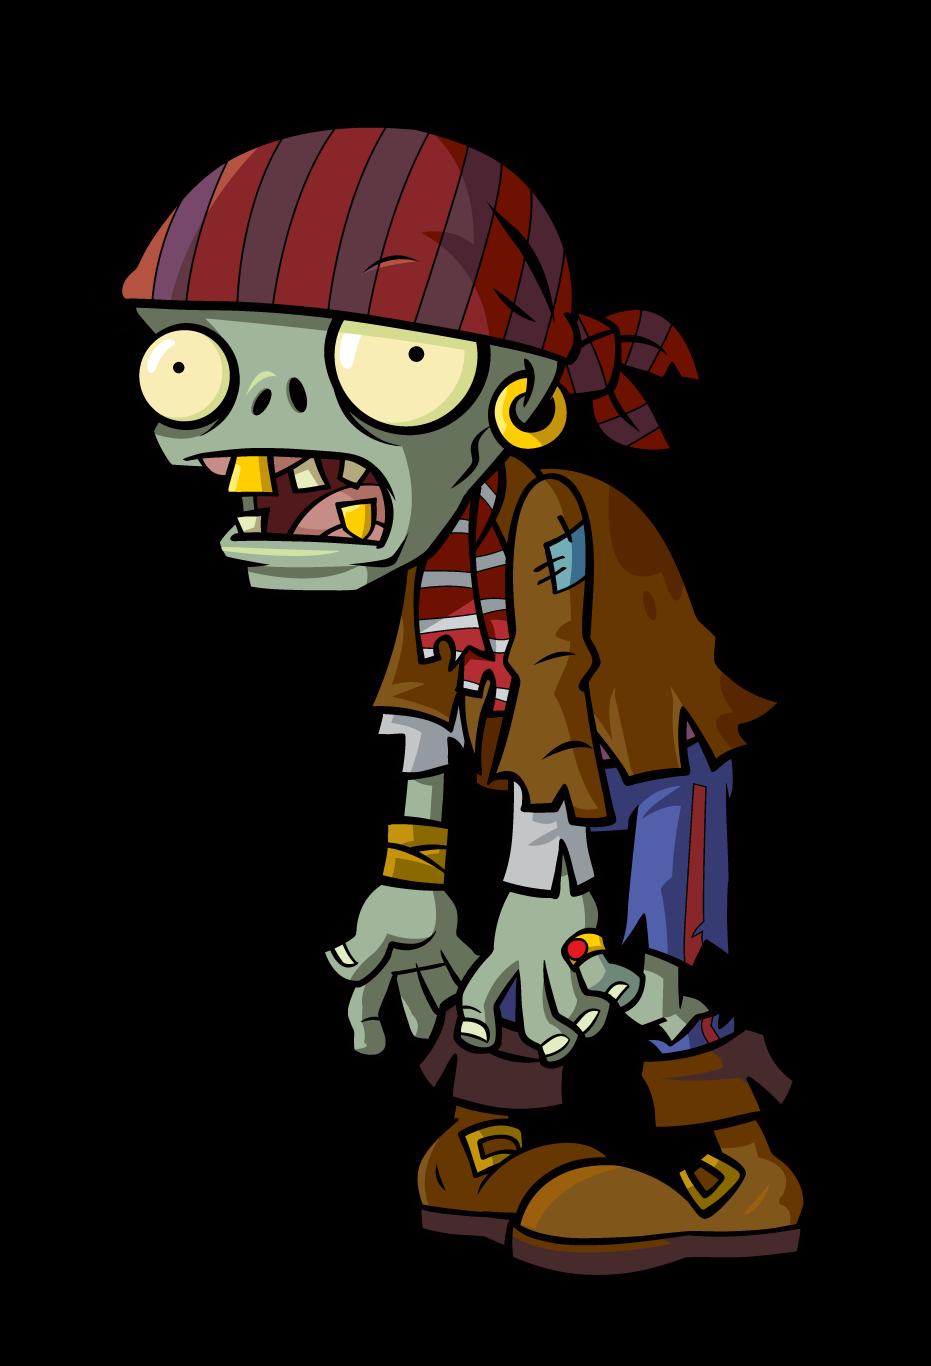 Cute halloween zombie clipart graphic zombi pirata | plantas vs zombies | Pinterest graphic